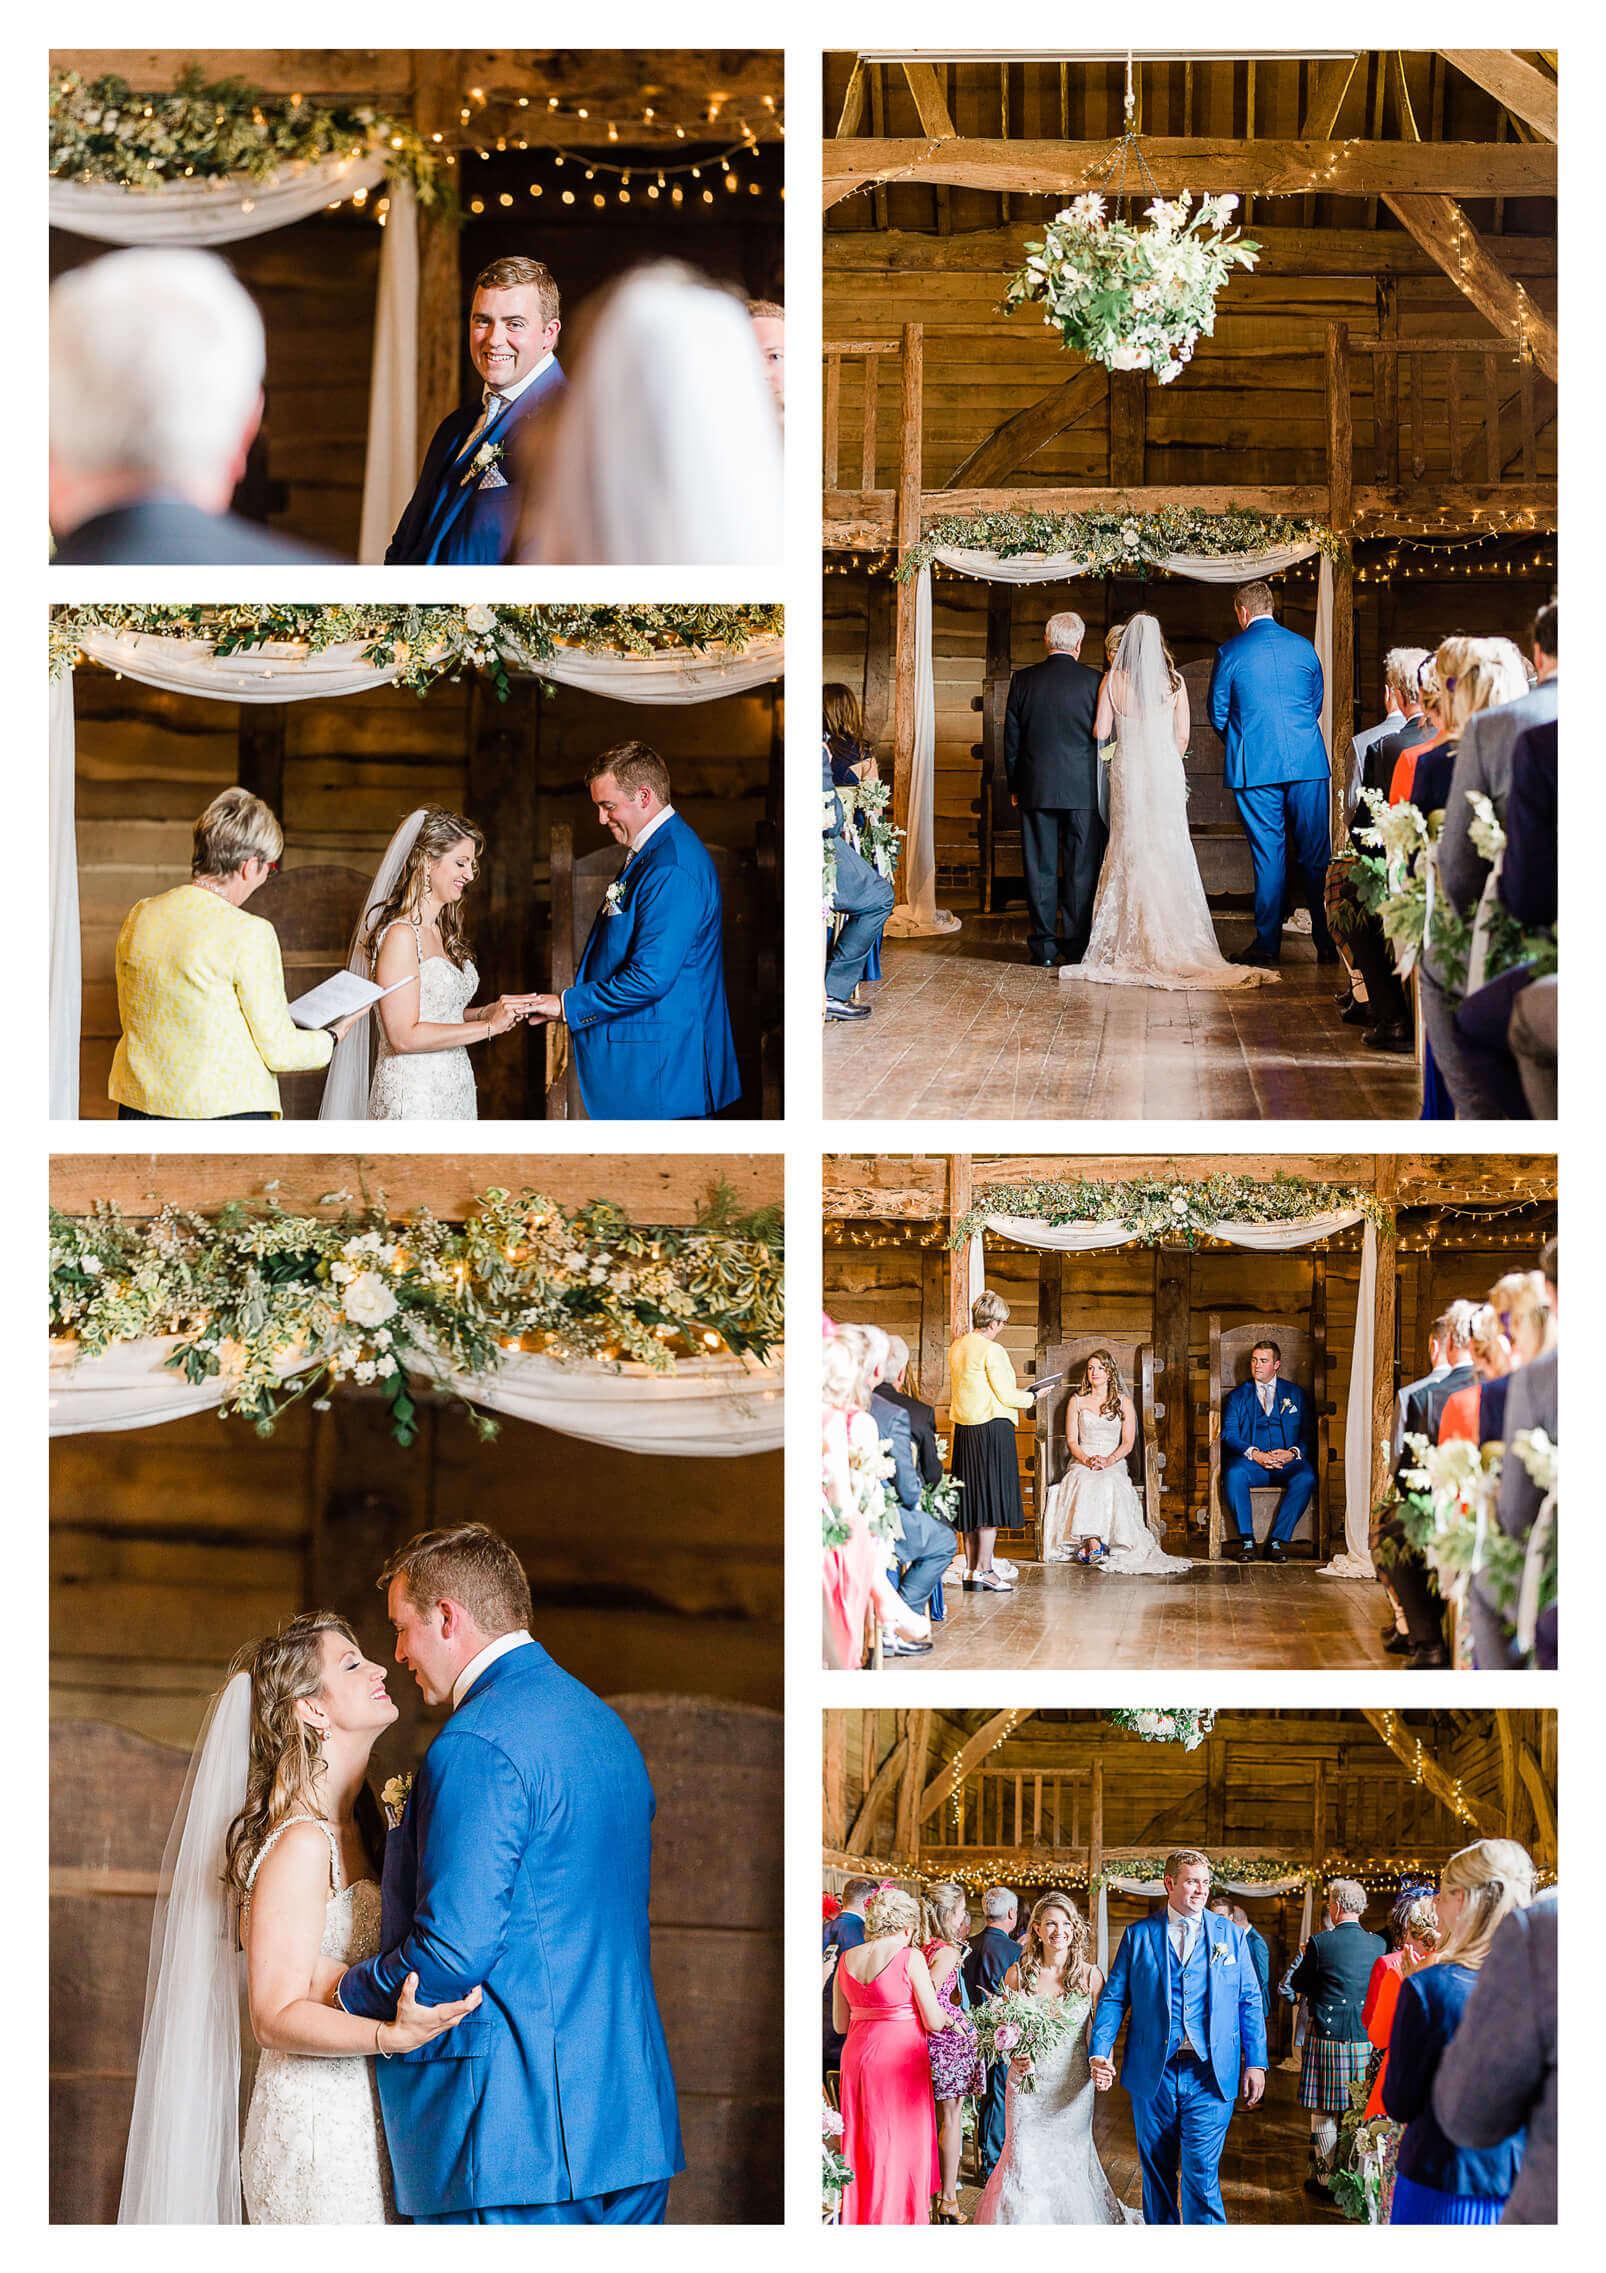 Michelham Priory barn wedding ceremony in Hailsham | East Sussex Photographer